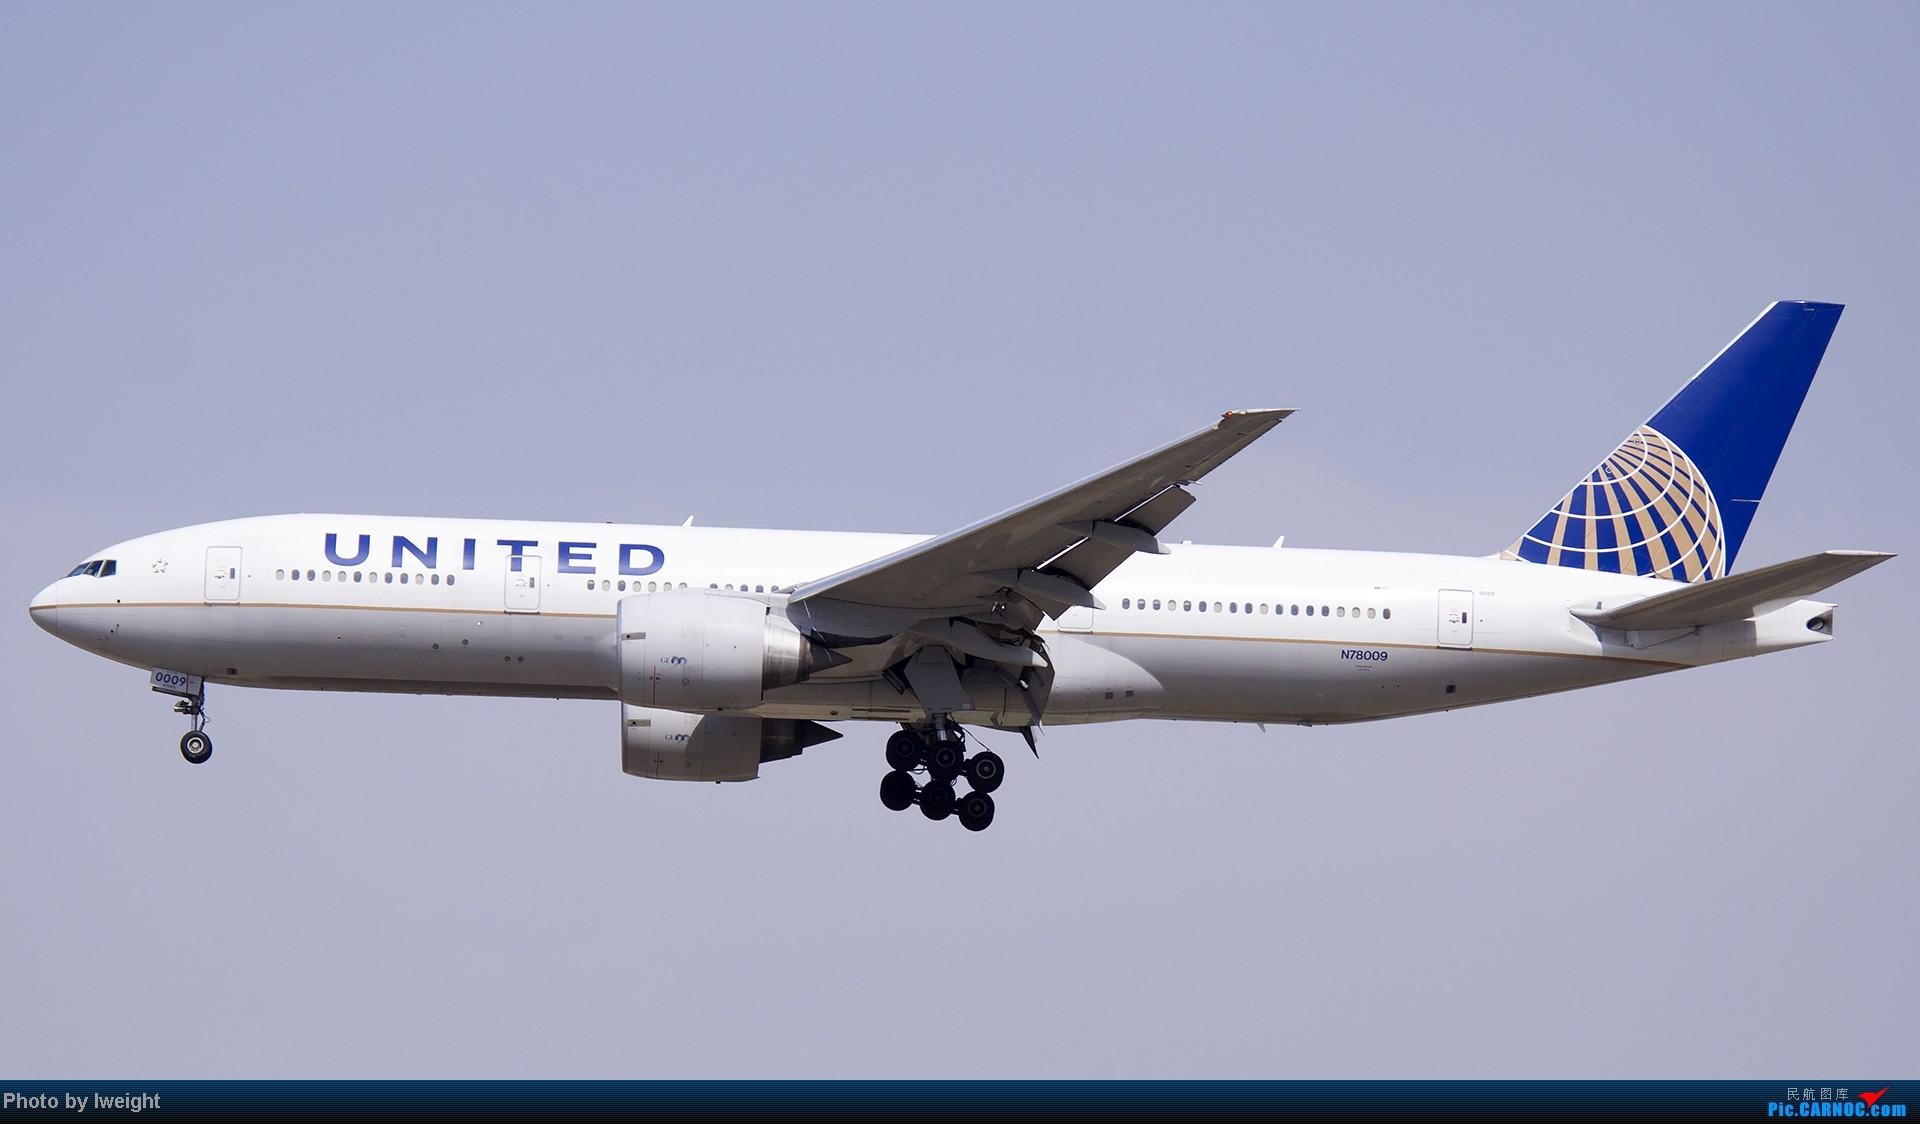 Re:[原创]5月3日首都机场风云变幻的下午 BOEING 777-200 N78009 中国北京首都机场